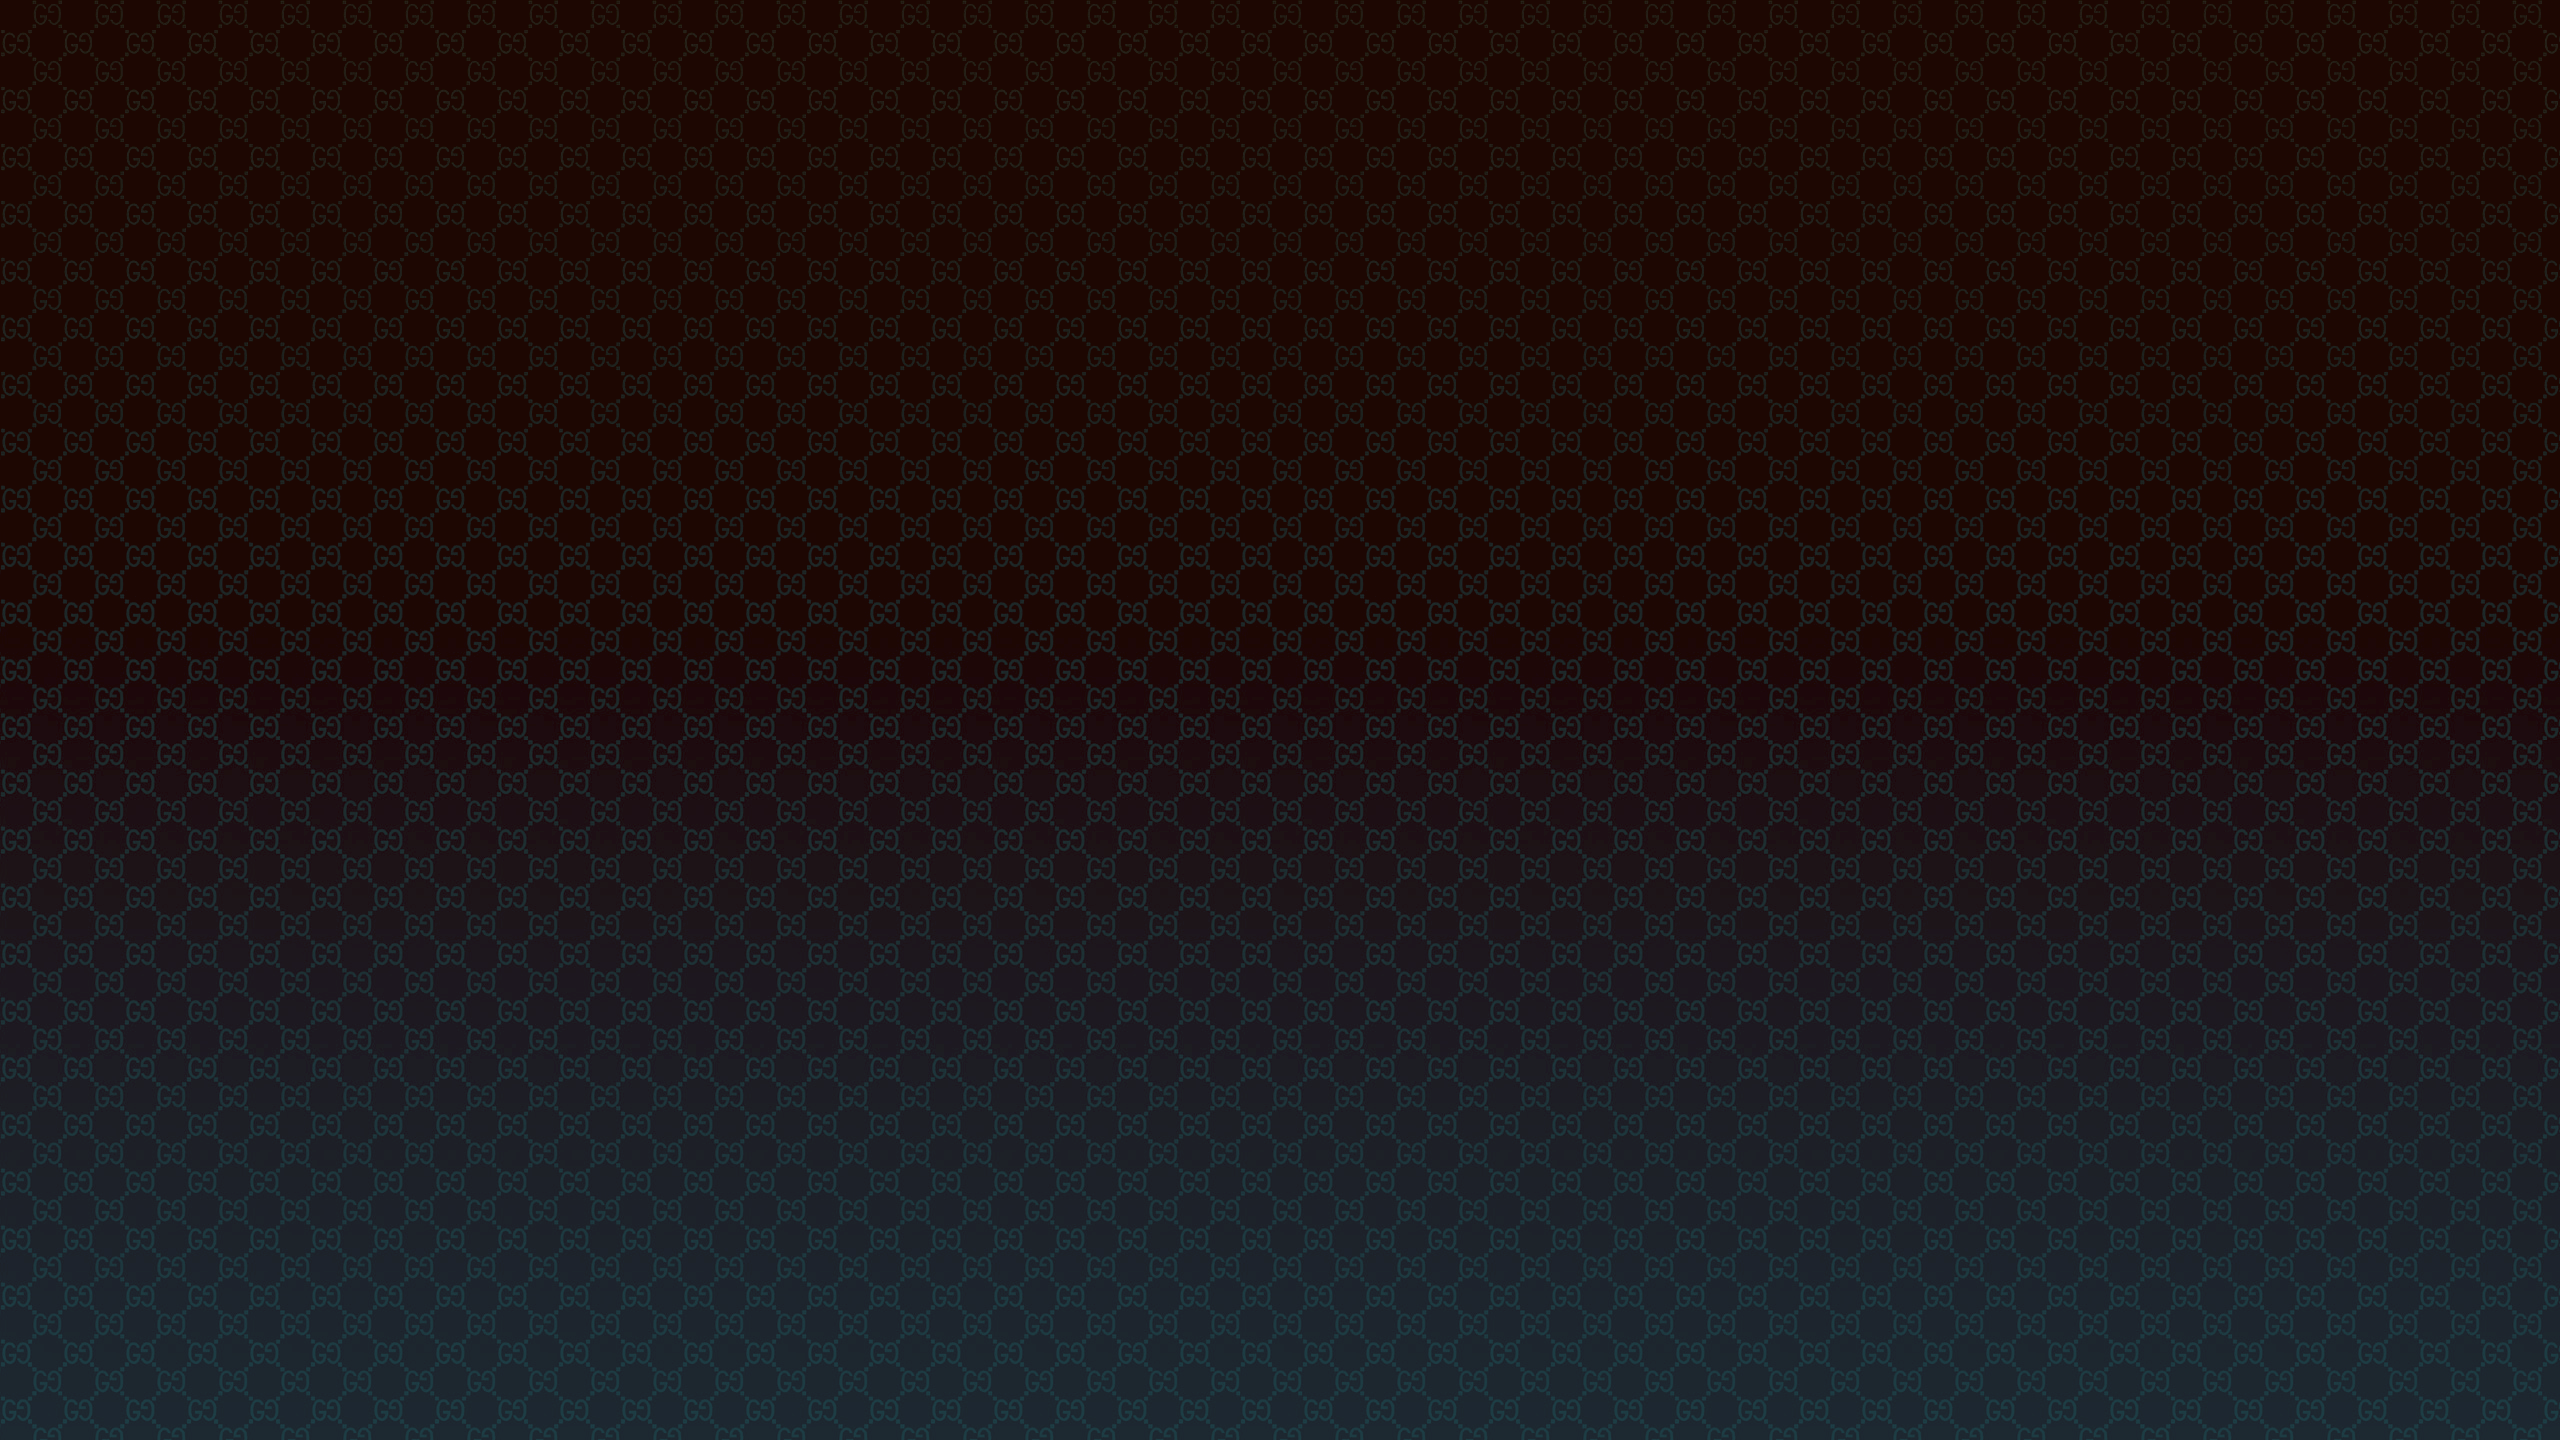 Fall Hipster Wallpapers Gucci Wallpapers Hd Pixelstalk Net